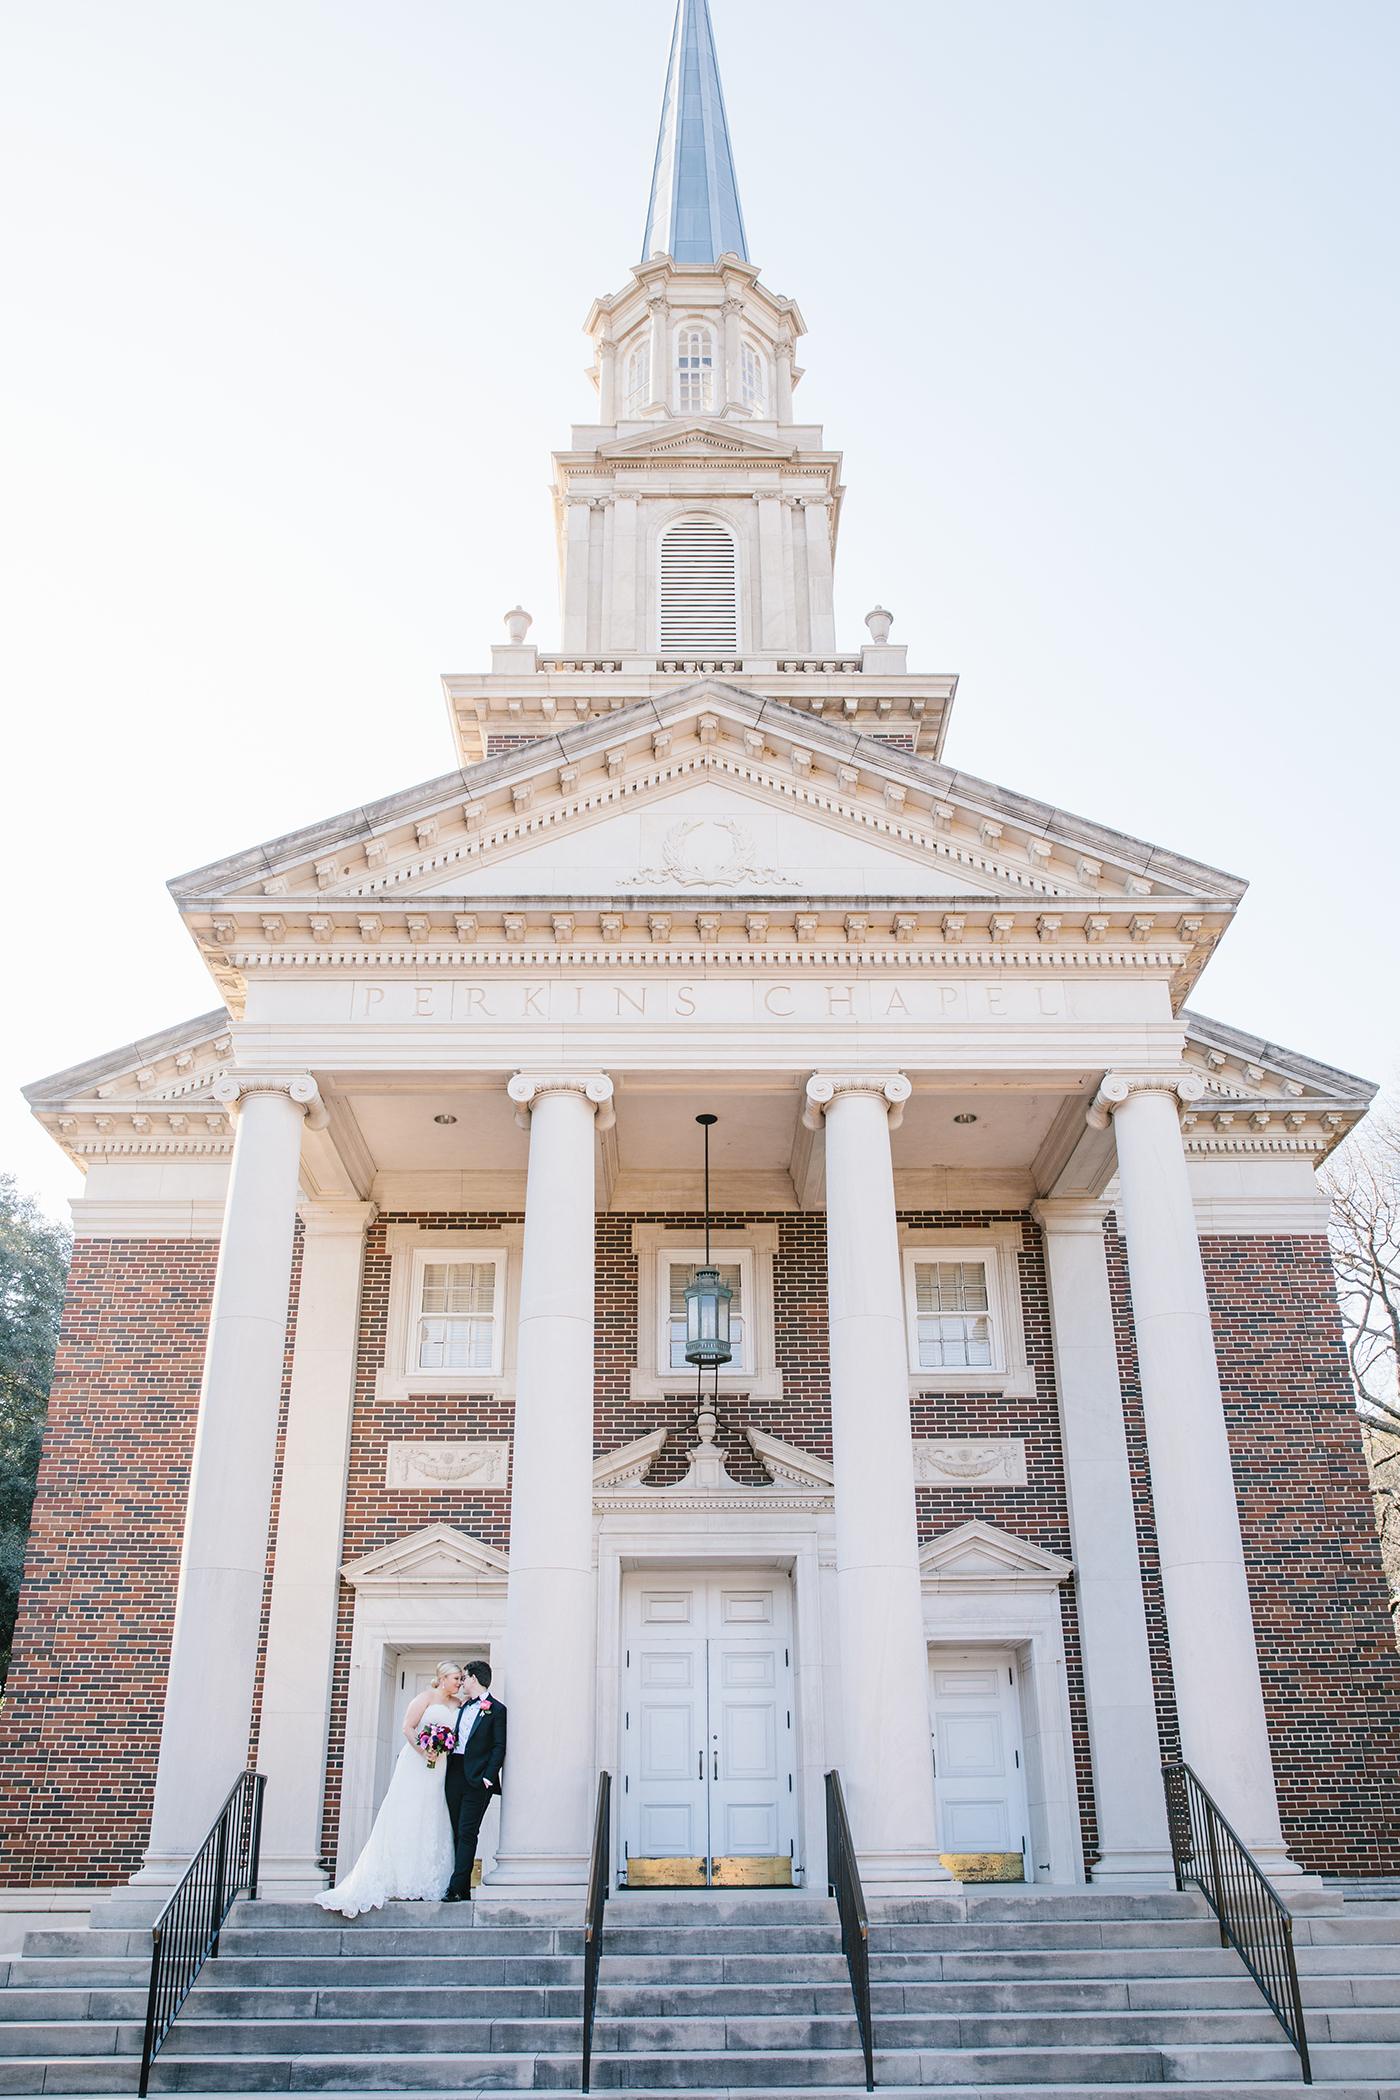 Dallas Weddings Planner - Allday Events - Katie + Matthew at The Adolphus Hotel - 204.jpg